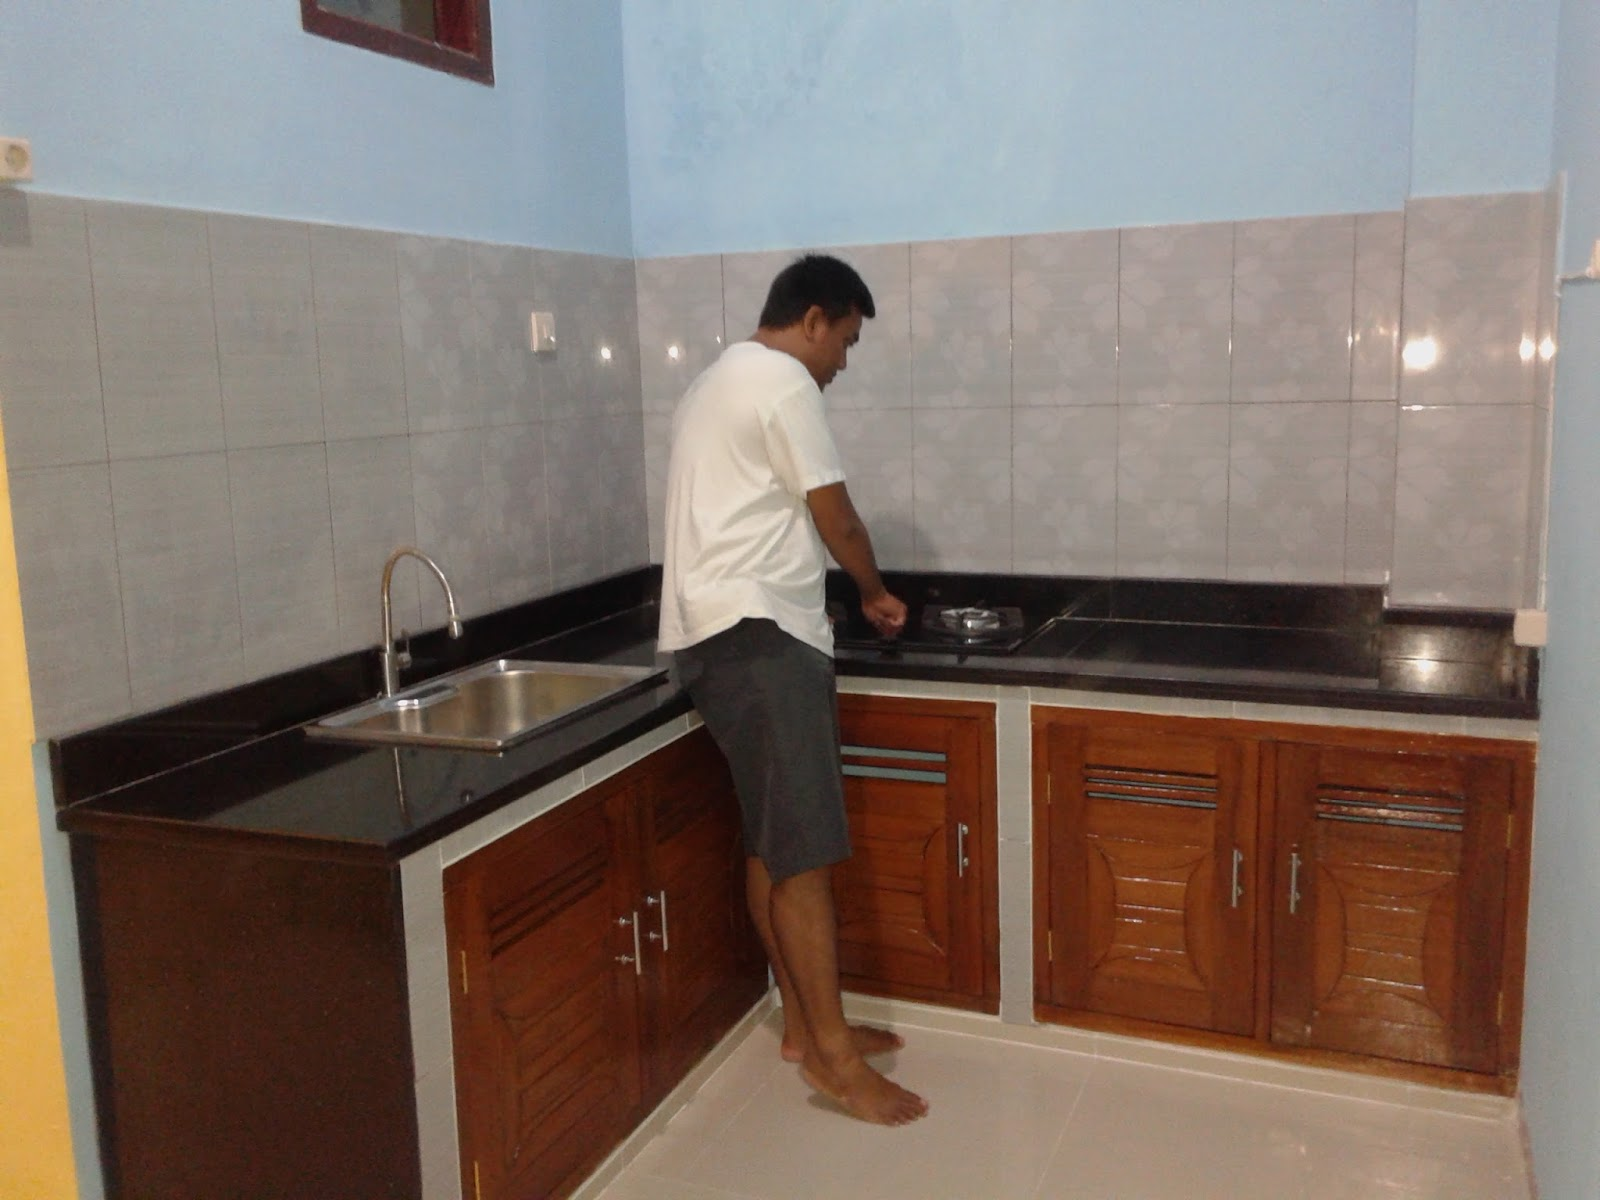 Desain Dapur Keramik Hitam Interior Rumah